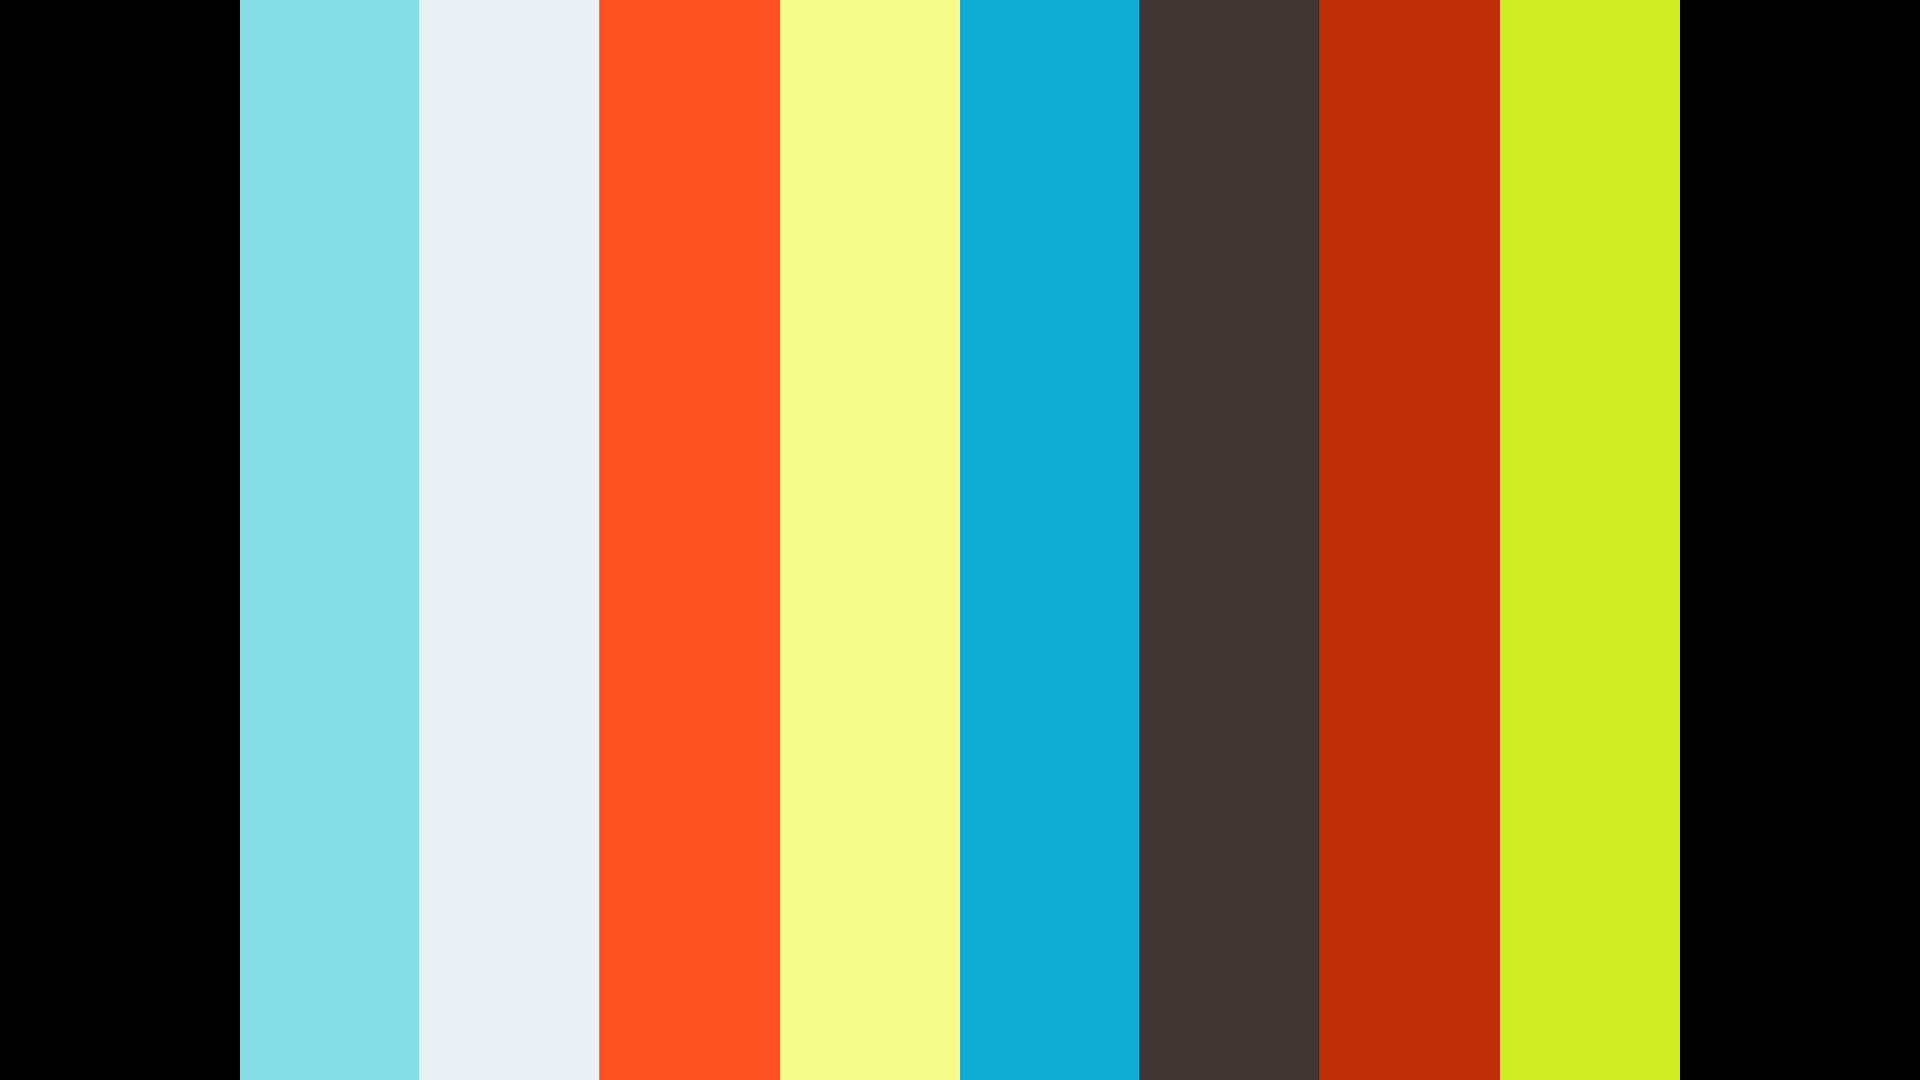 Programme(s) Commun(s) 2020 : Semaine 2 (teaser)